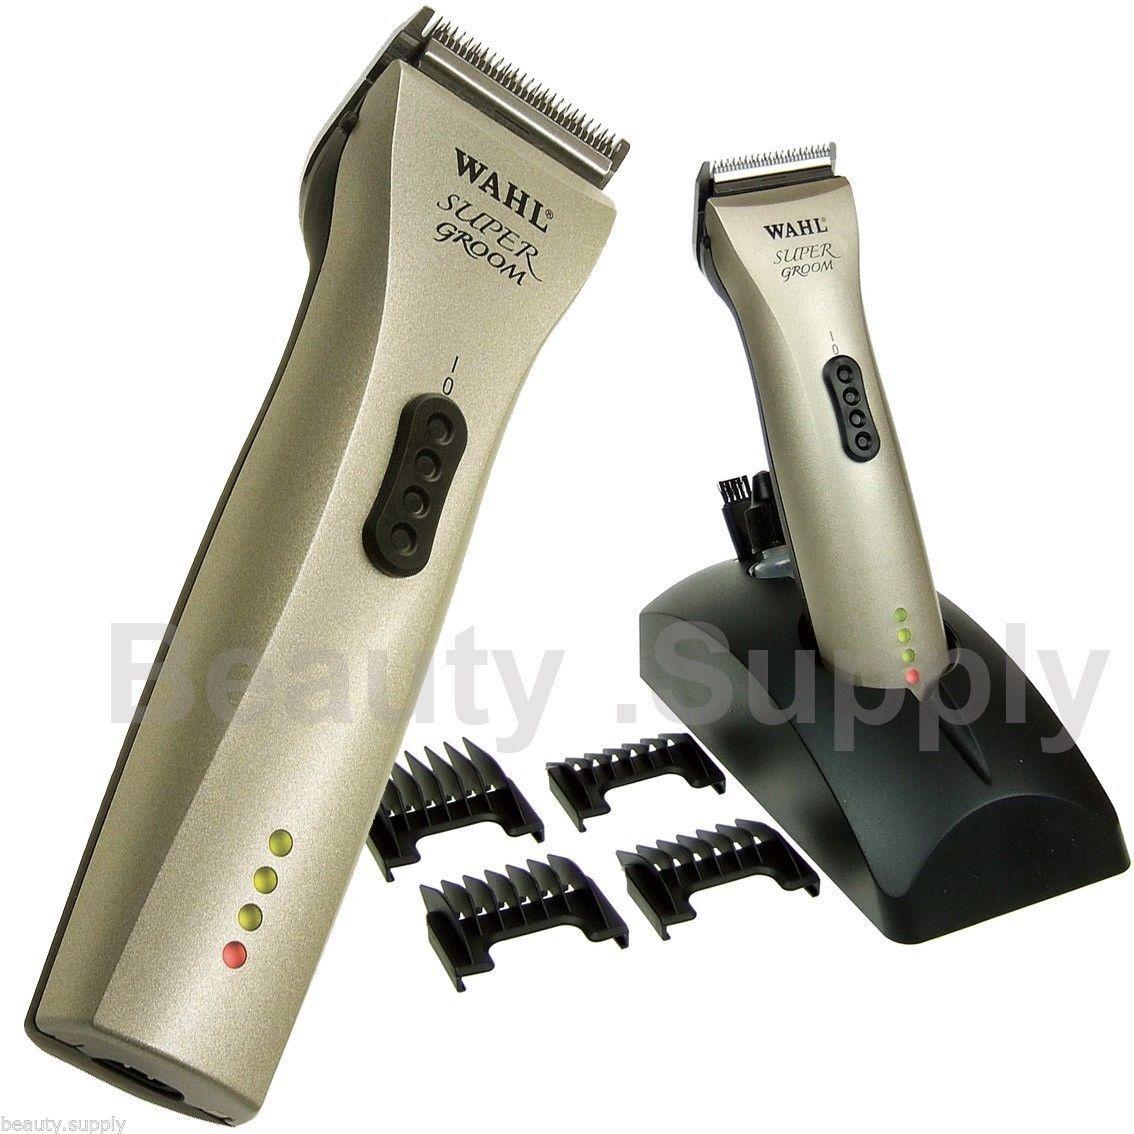 Wahl Super Groom Animal Hair Grooming Clipper 1872-0275Pet Dog Horse